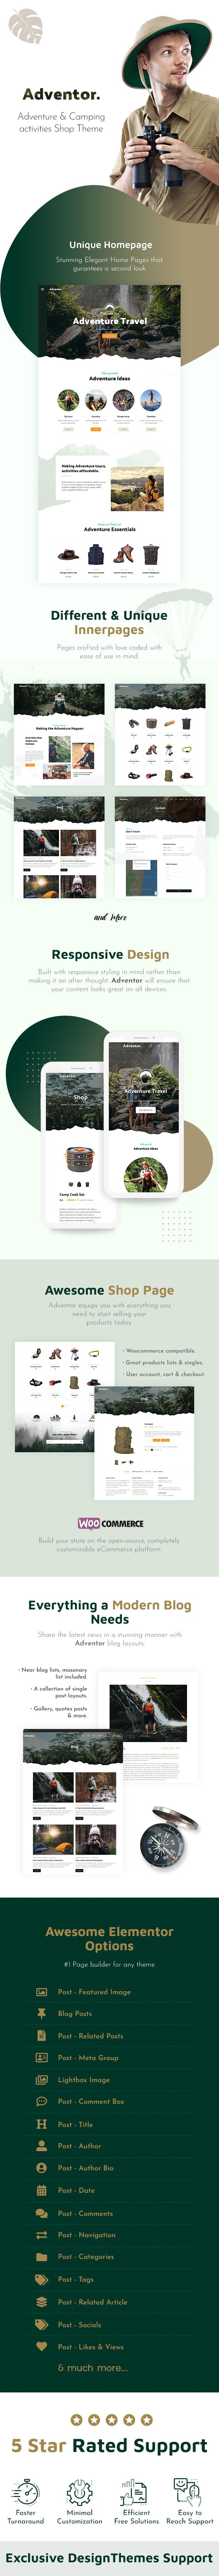 Adventor - Travel and Adventure WordPress Theme - 1